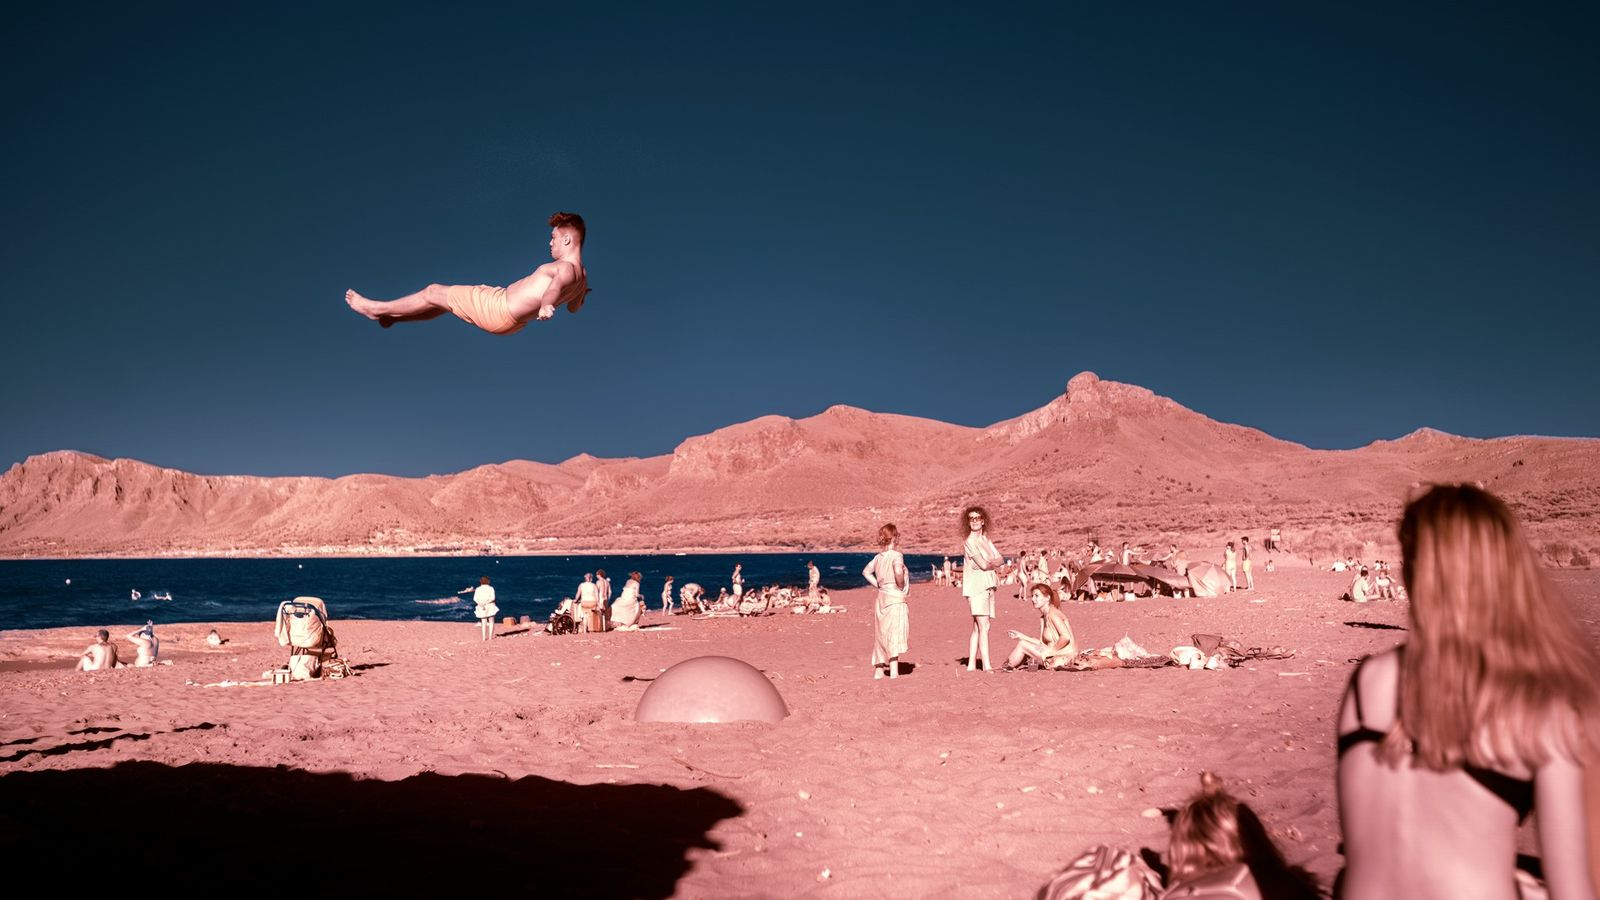 At Son Serra de Marina, locals enjoy a quiet day at the beach just before Mallorca ...